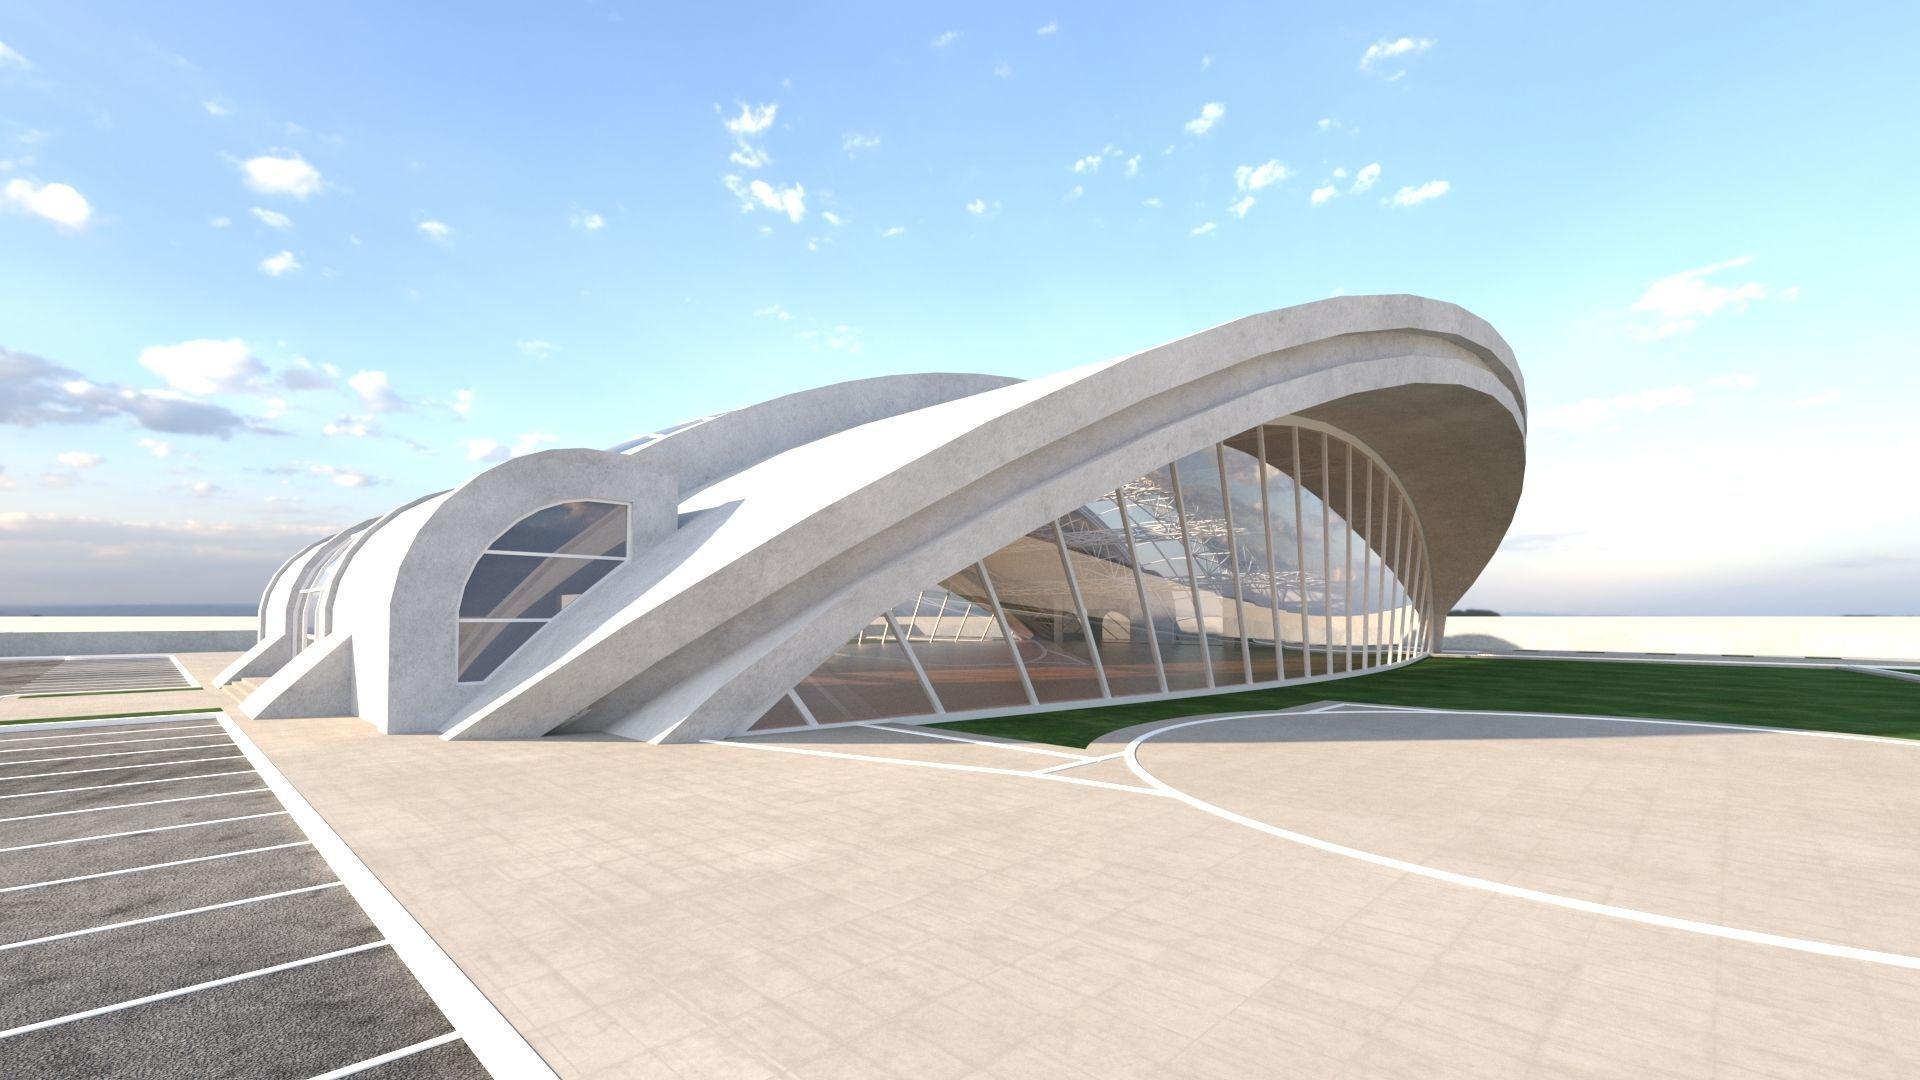 exhibition center exterior and interior